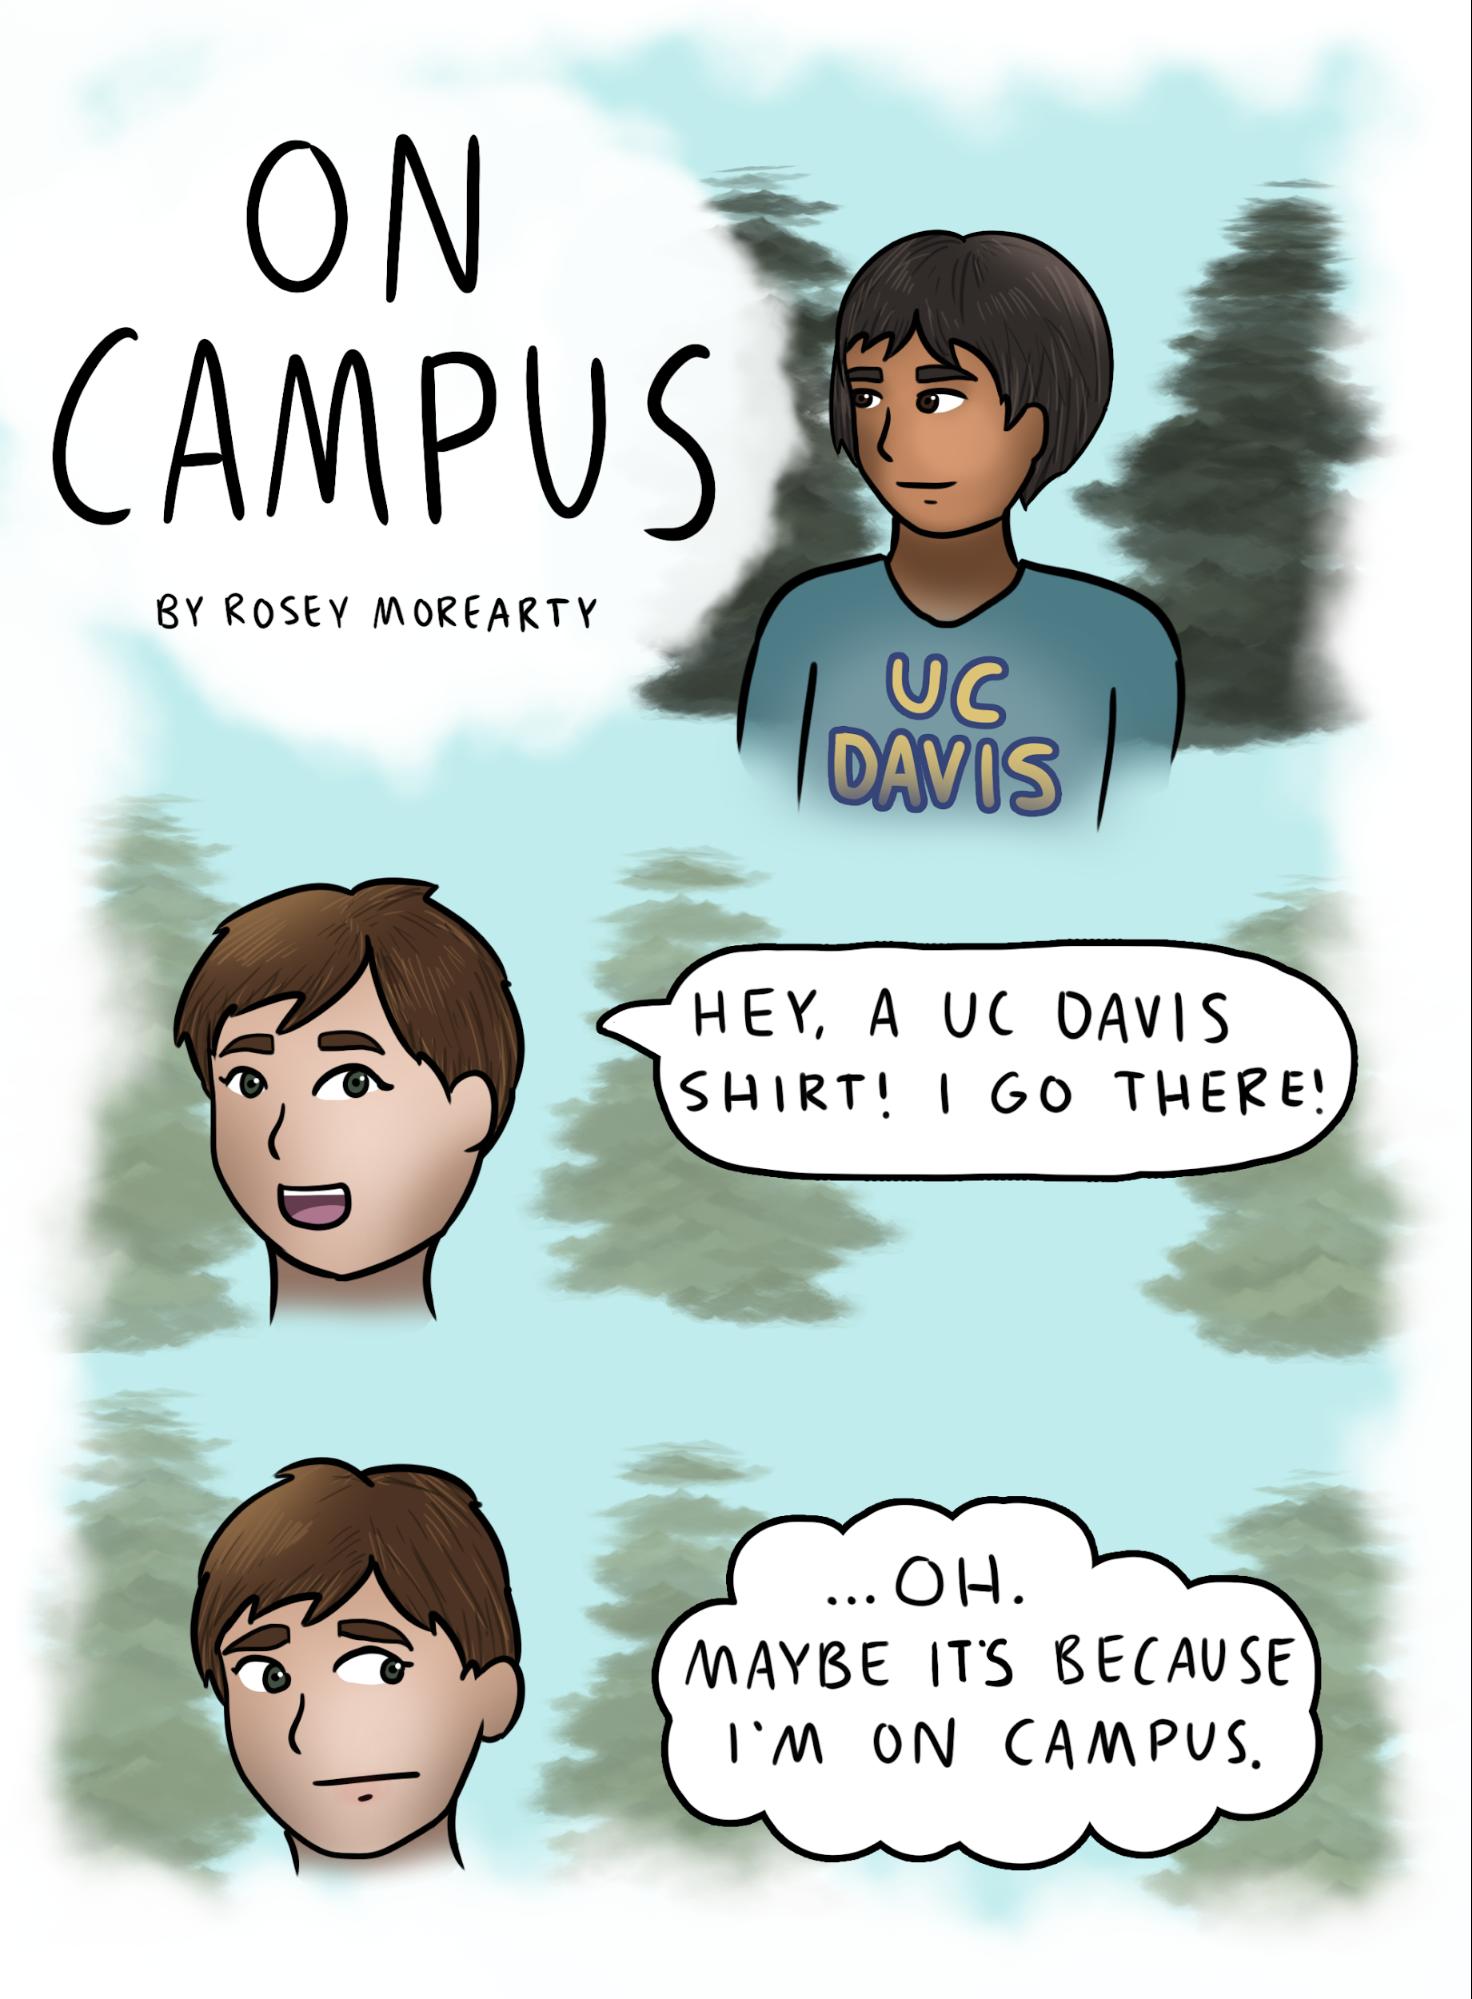 Cartoon: On Campus